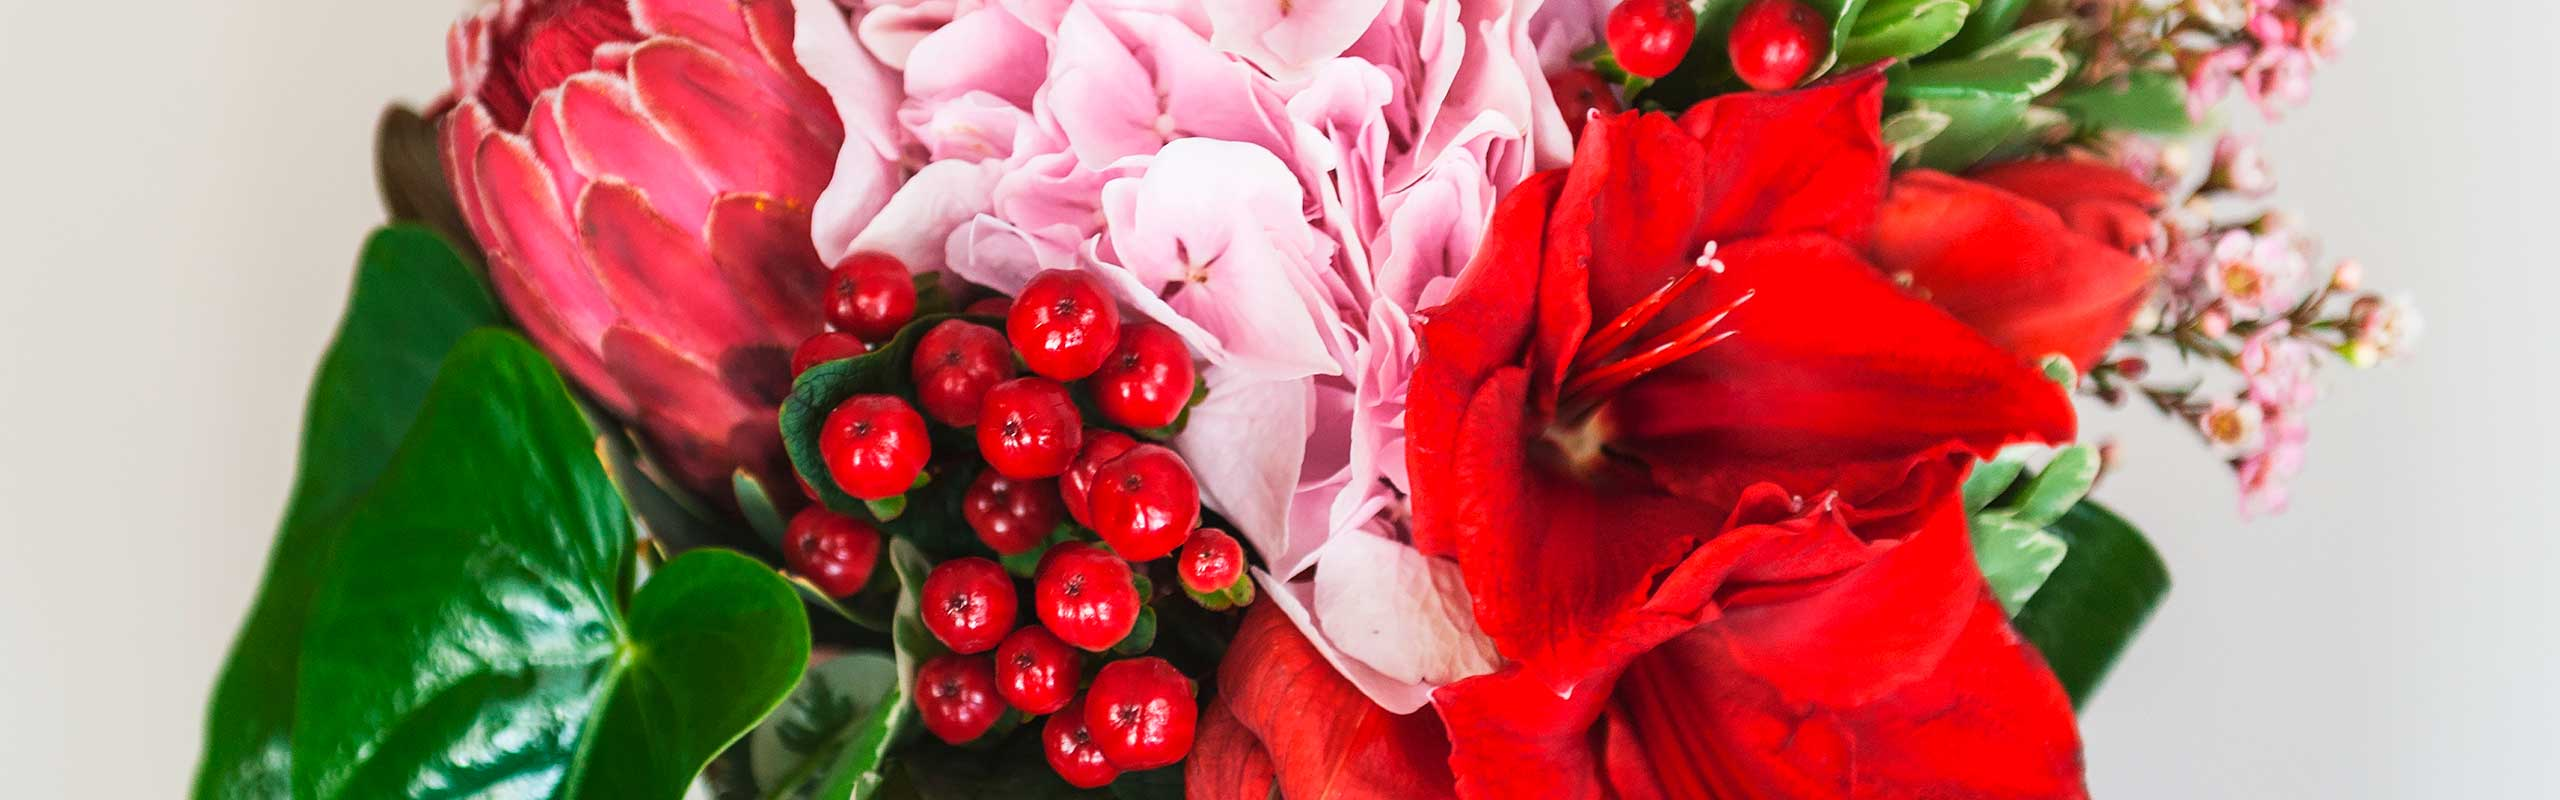 gruber halfing floristik header 1 Floristik